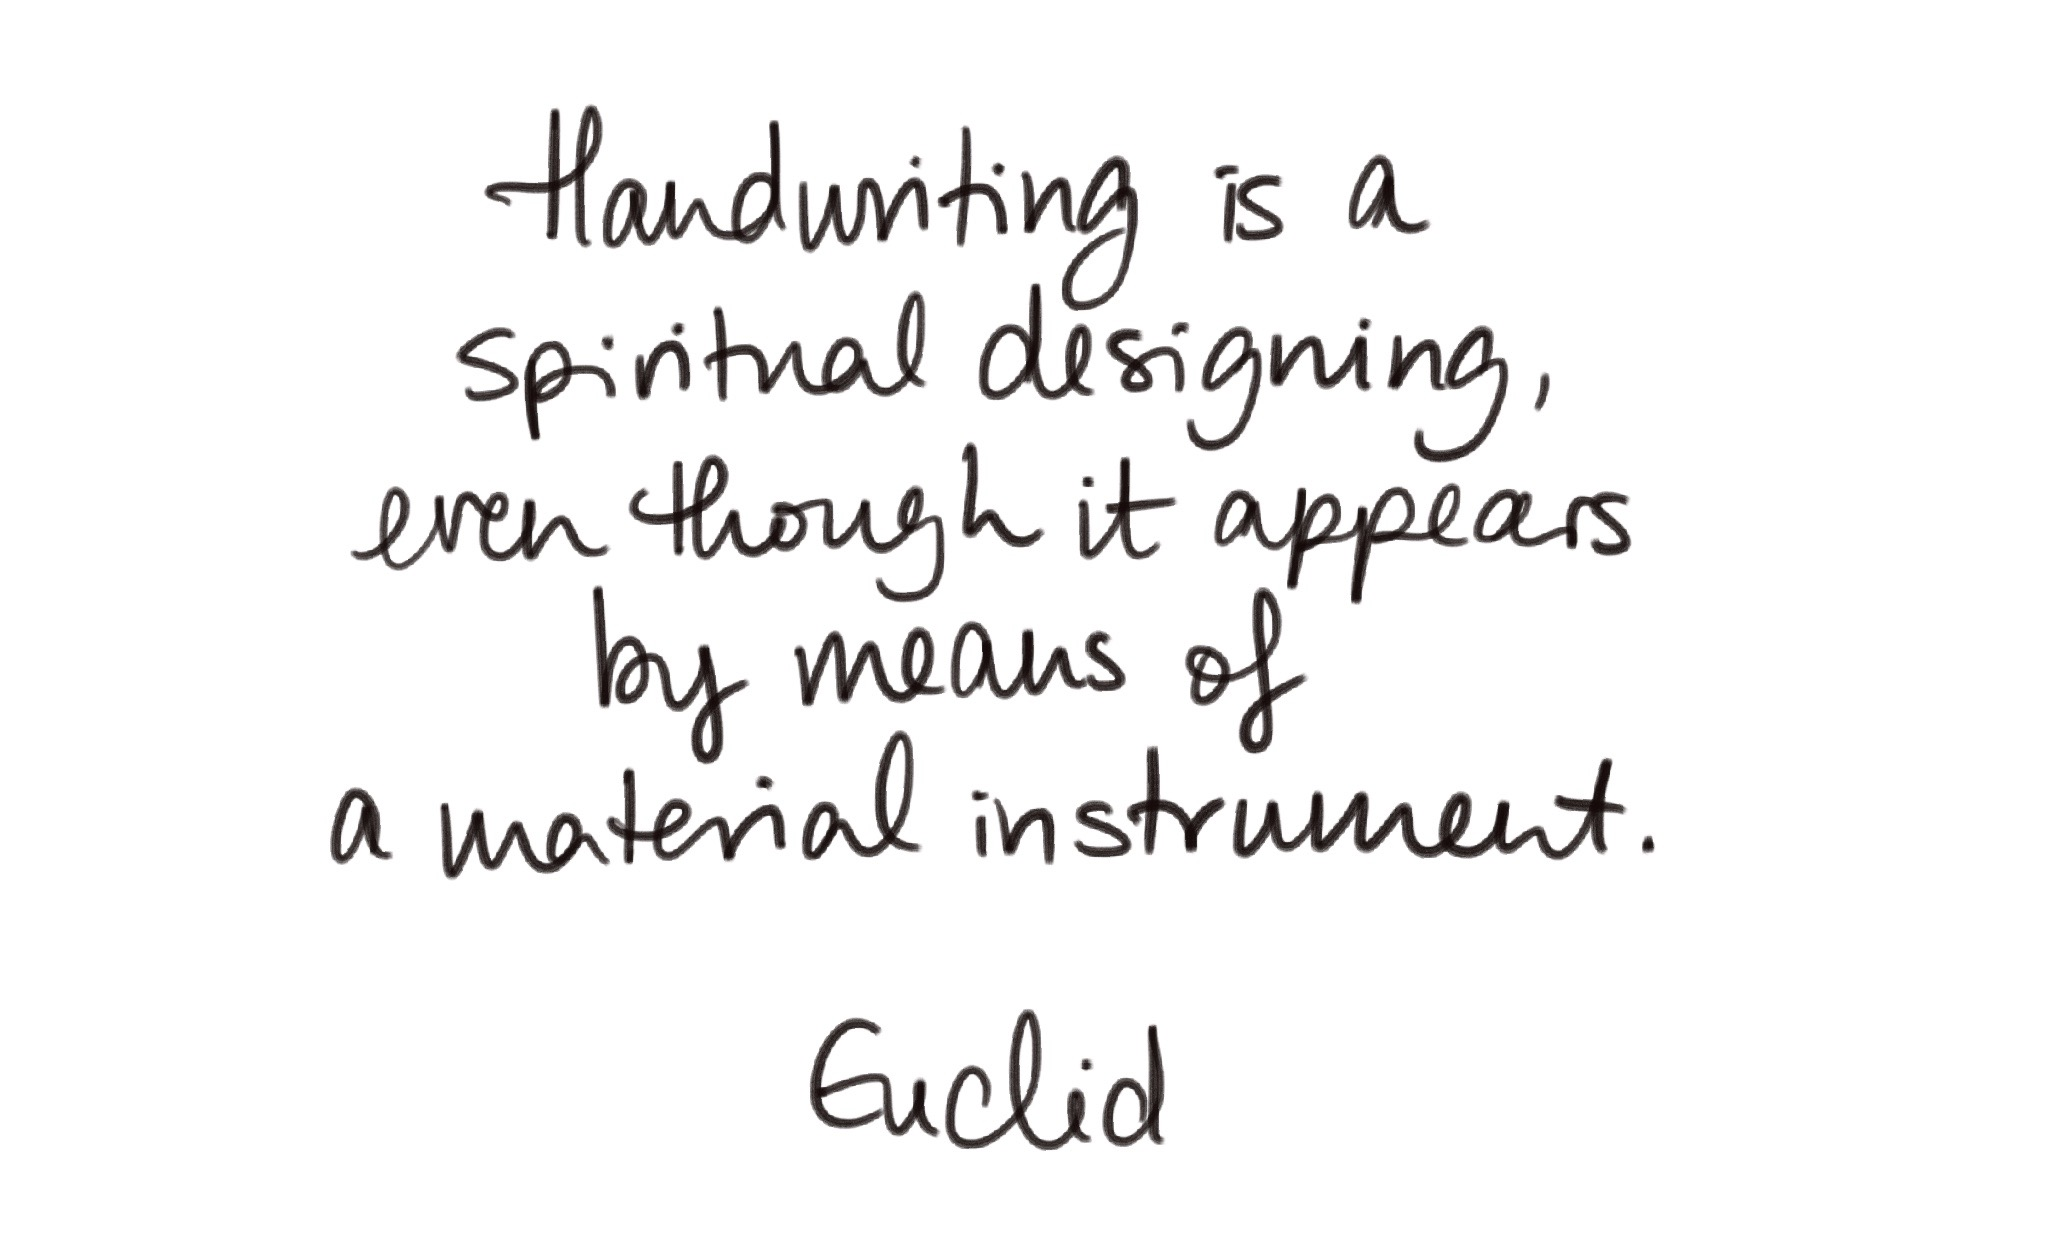 handwriting quote euclid - 1.jpg